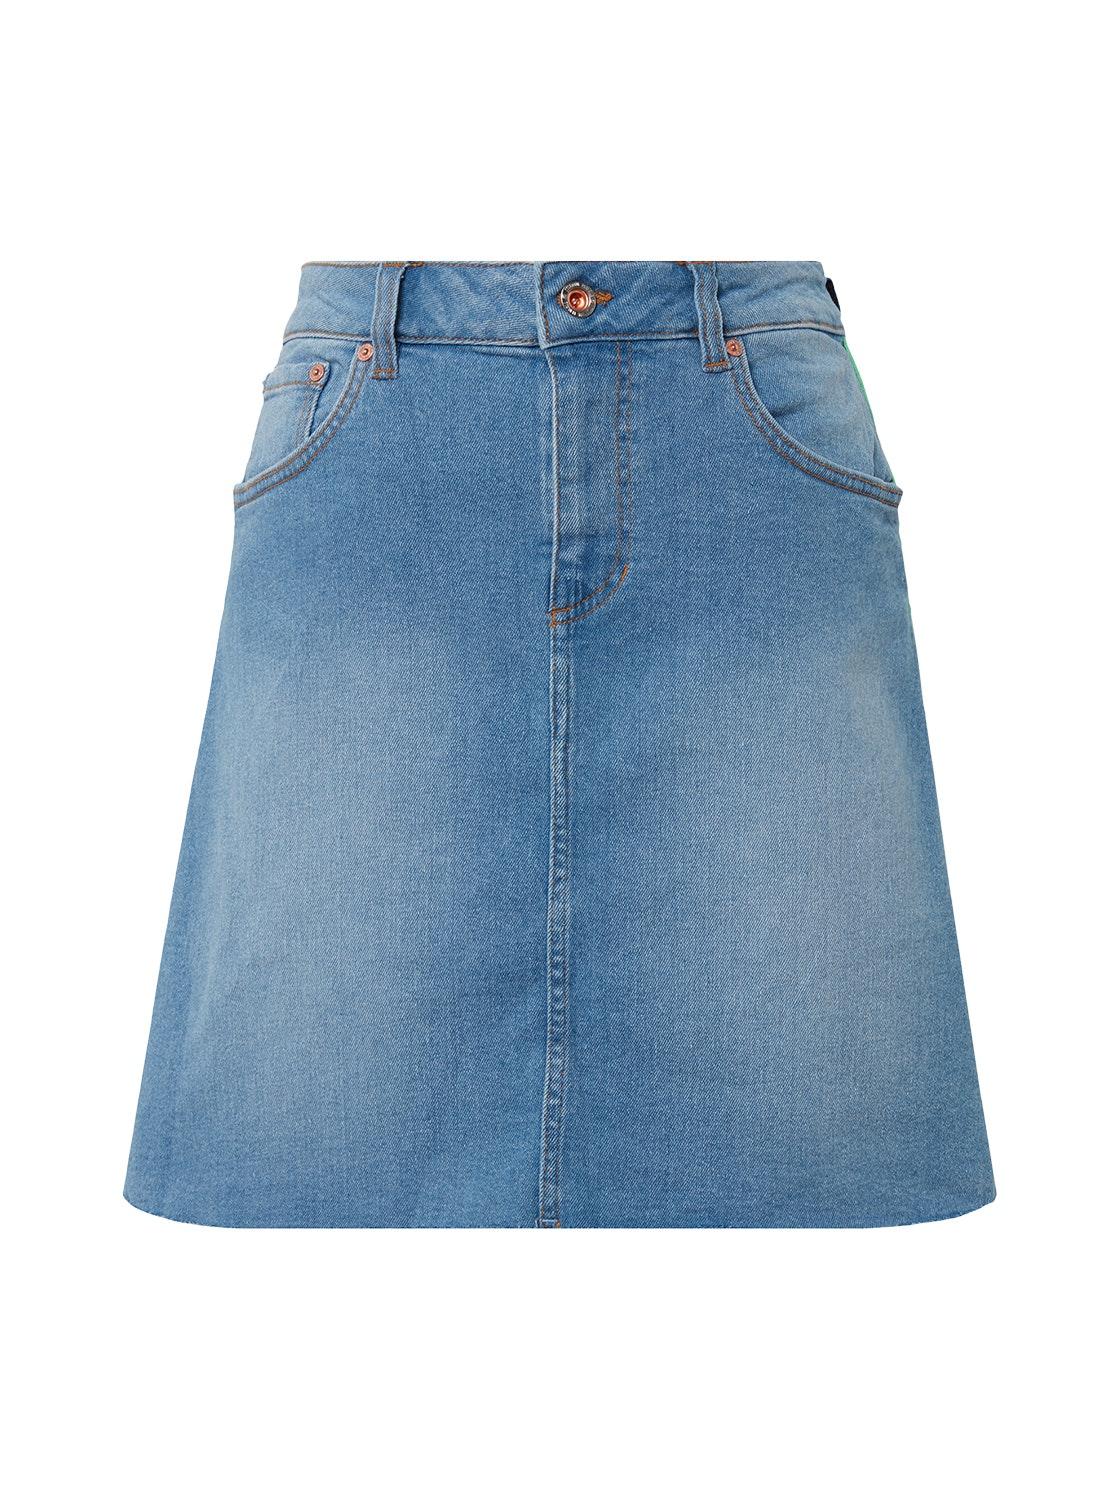 denim skirt with sidetape, mid stone wash denim          Blue